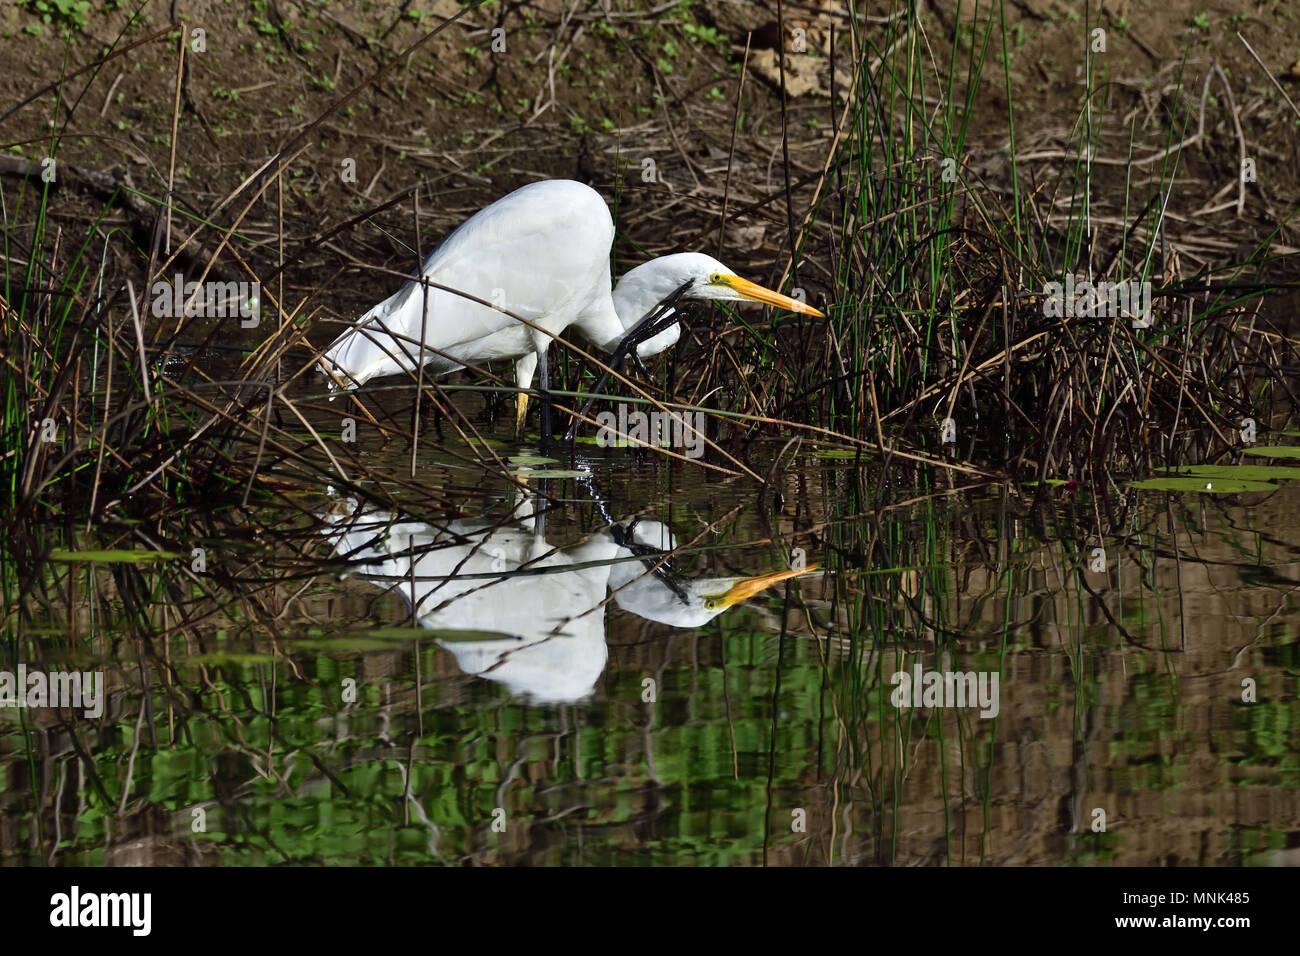 An Australian, Queensland nonbreeding Great Egret, Ardea alba looking for food scratching its Head - Stock Image